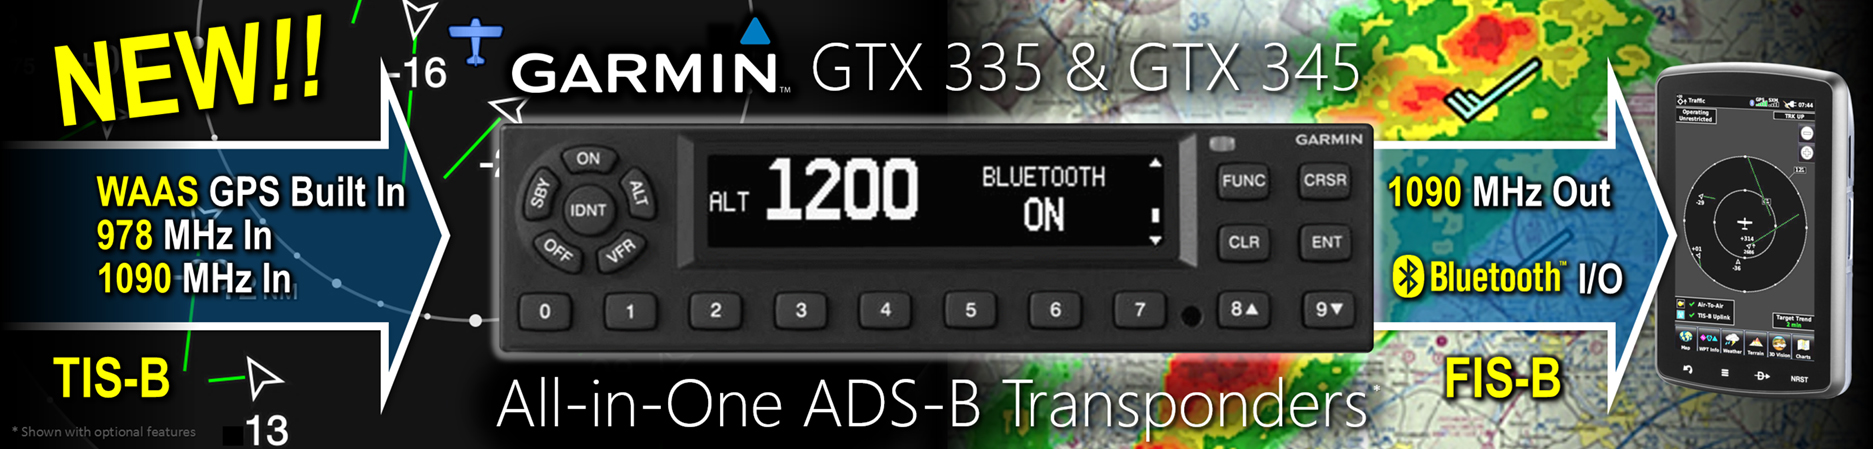 Garmin-GTX-335-345-Banner-1873x449